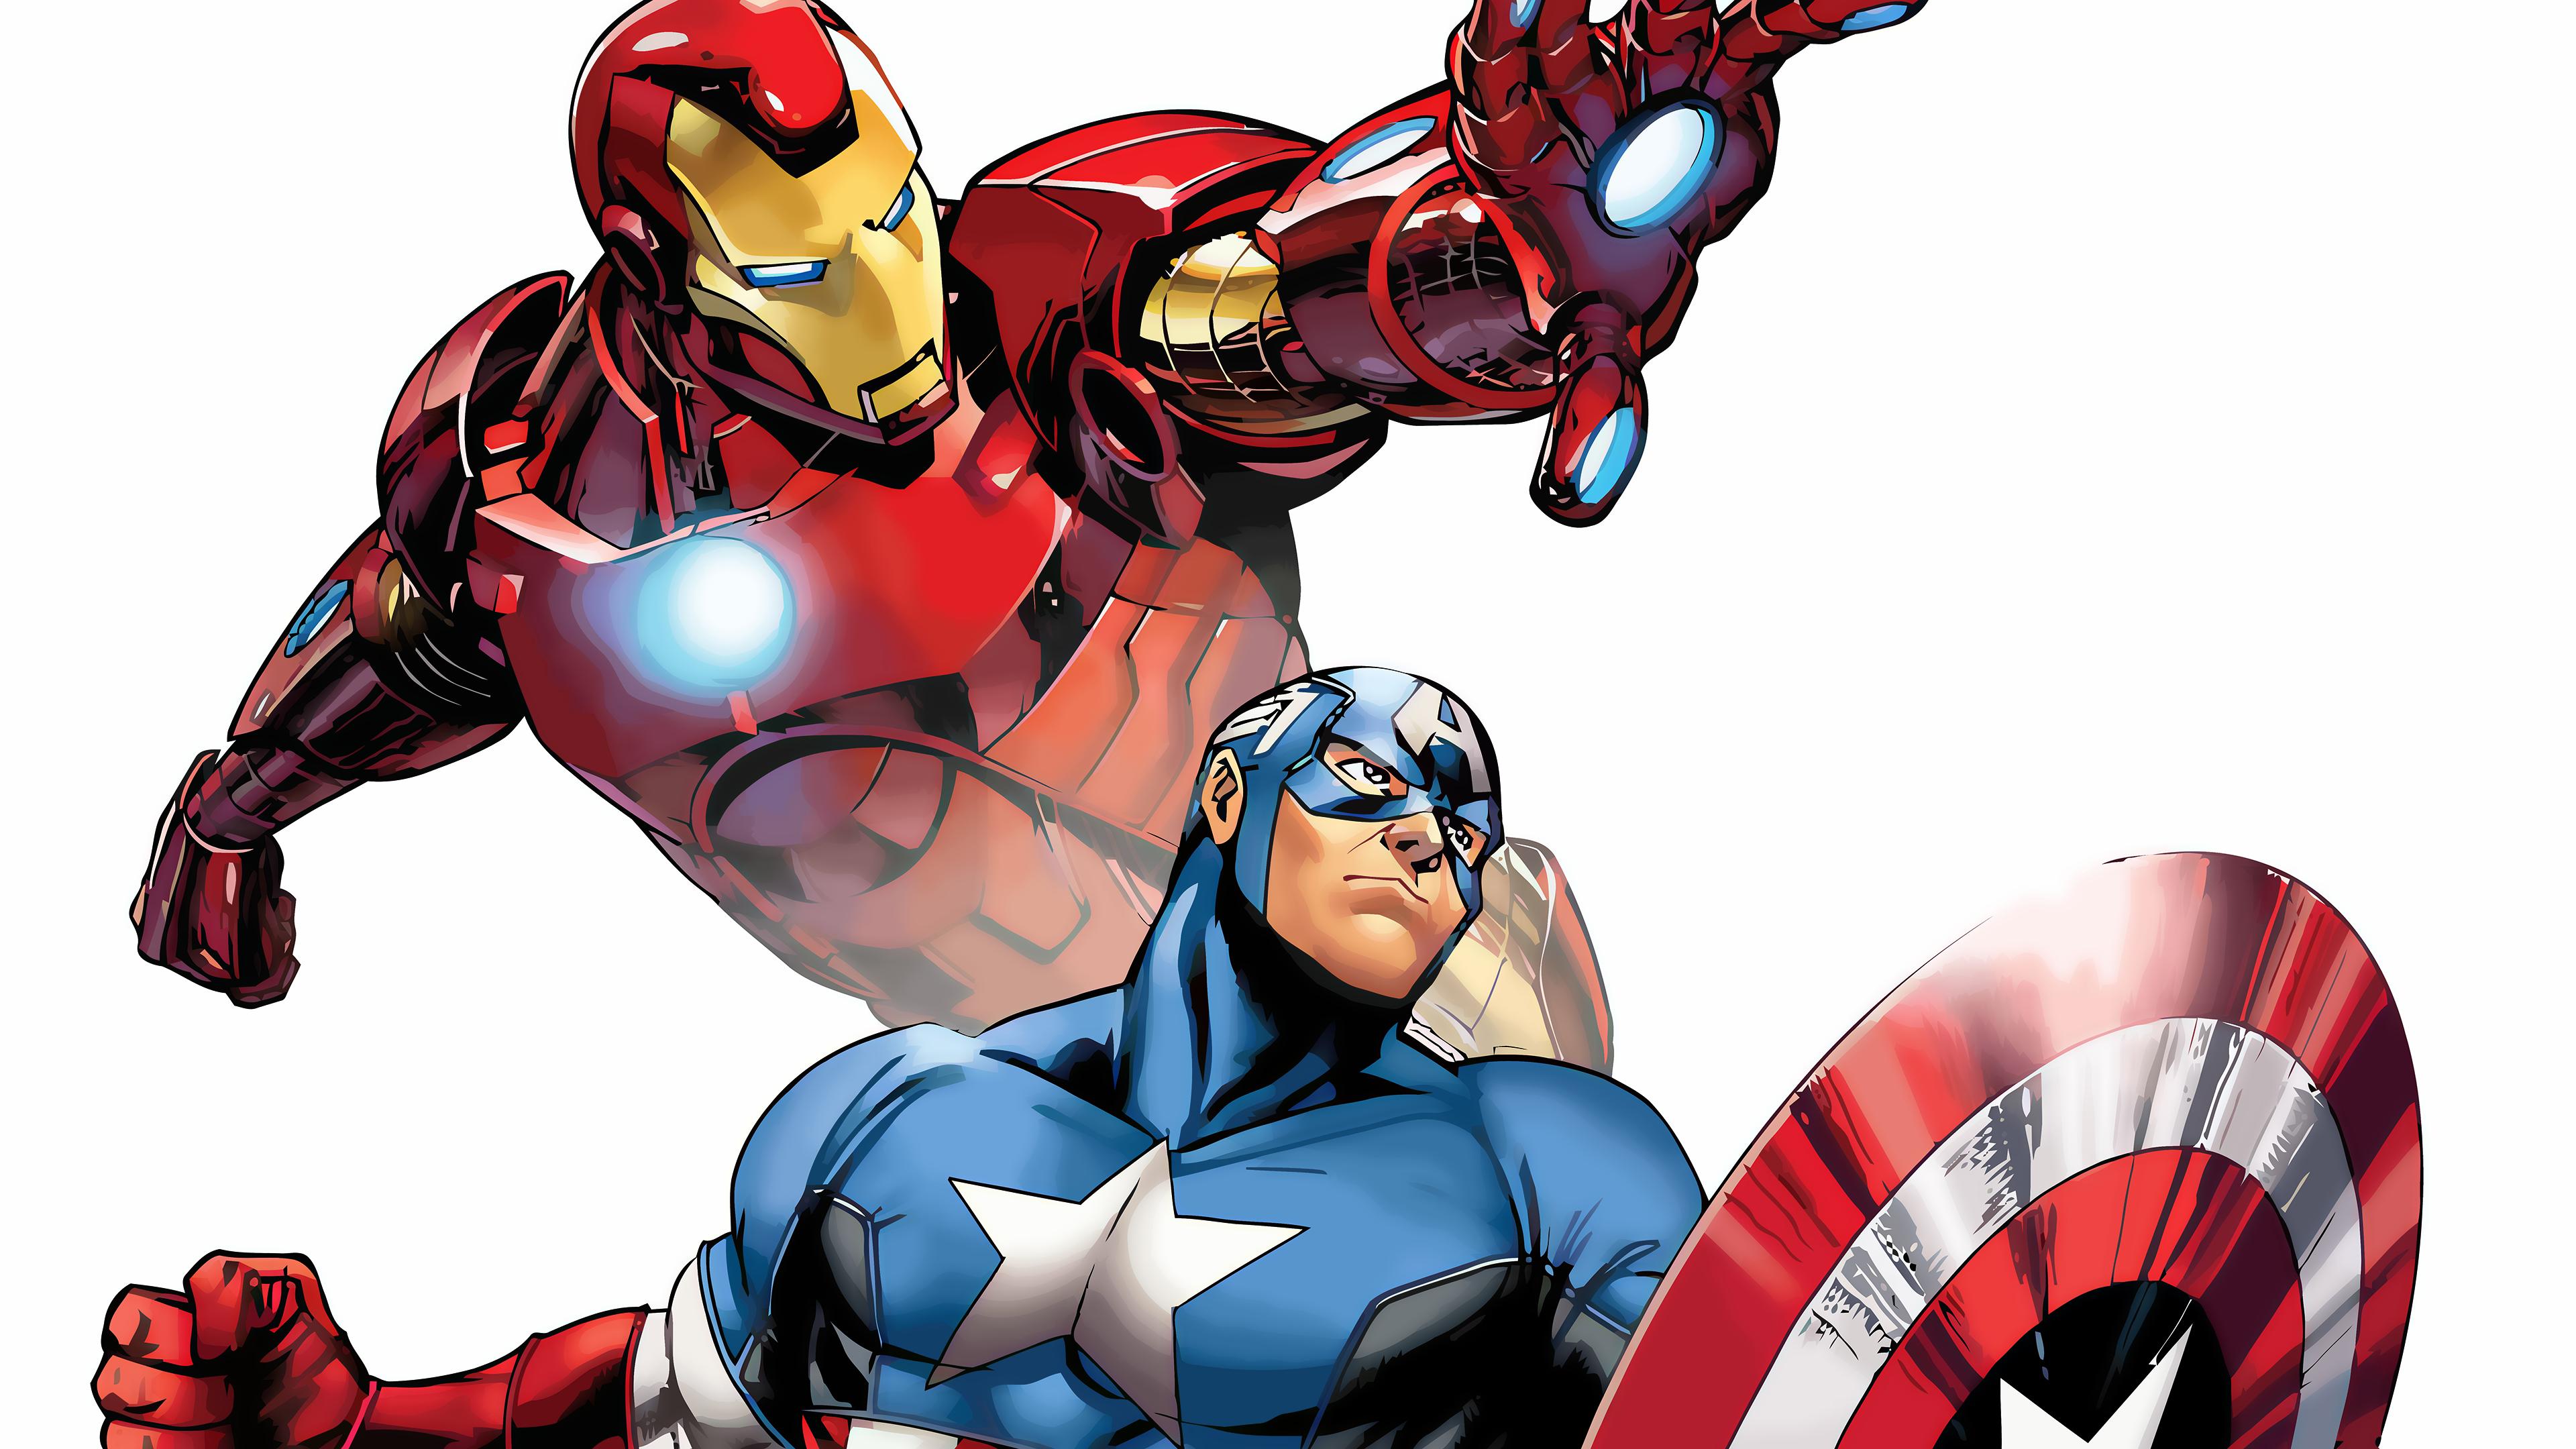 Captain america comics clipart best - Iron man cartoon download ...